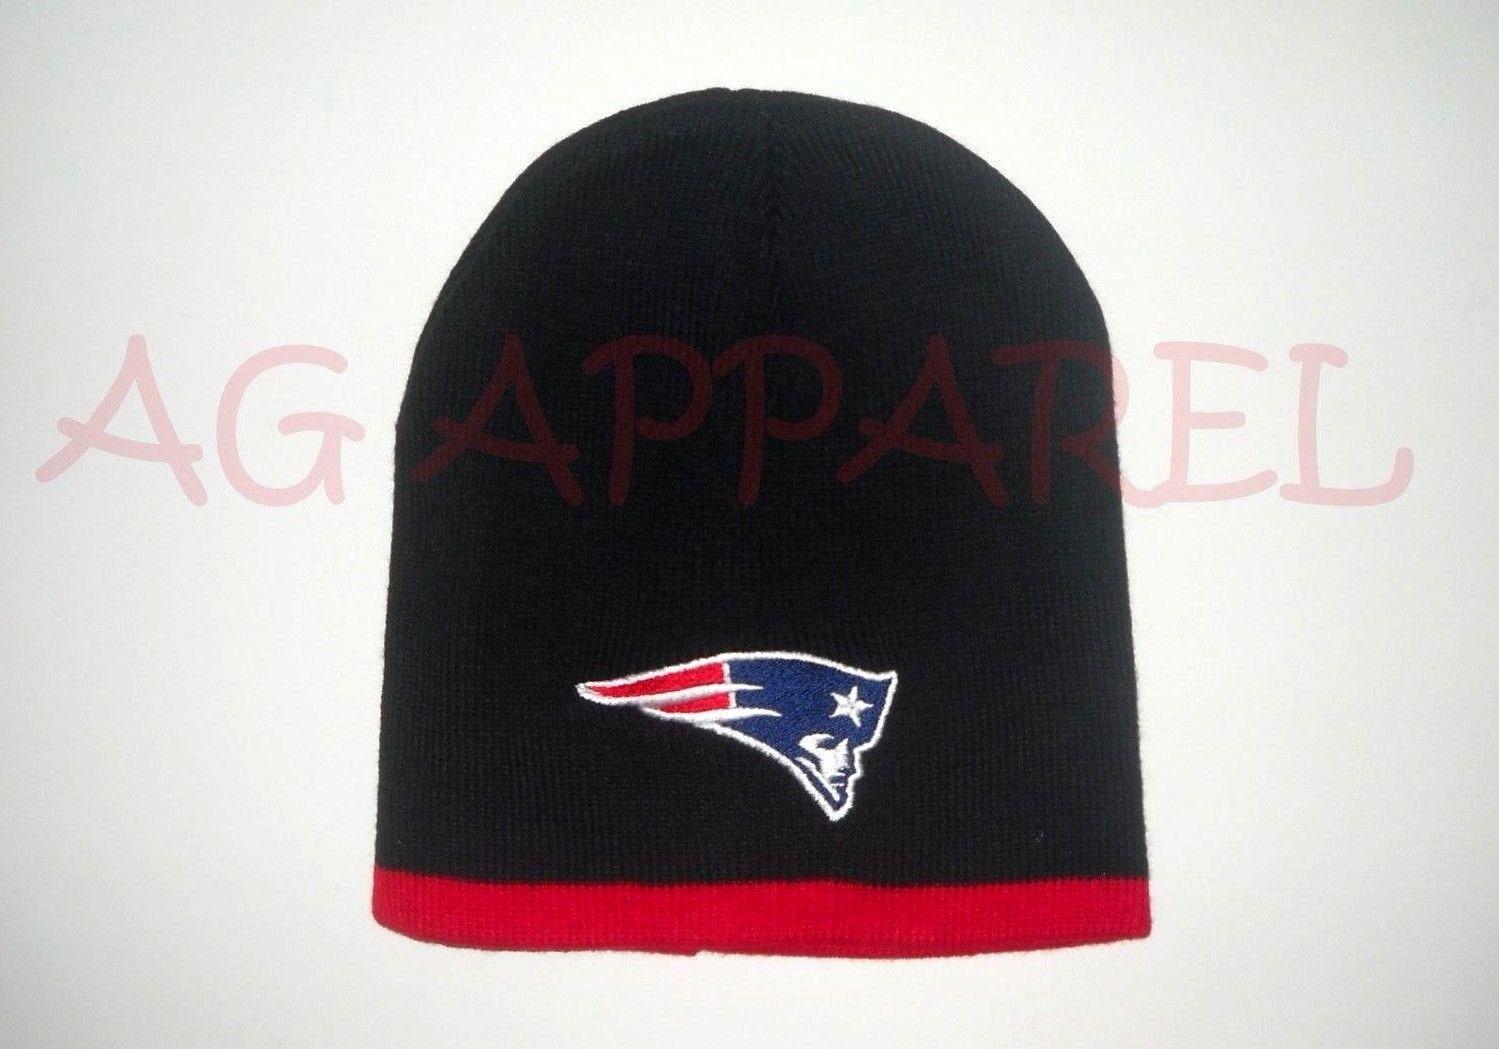 d383d0e7073 New England Patriots Winter Short Beanie Skull Cap Hat Pick Your  Color Style New  9.45